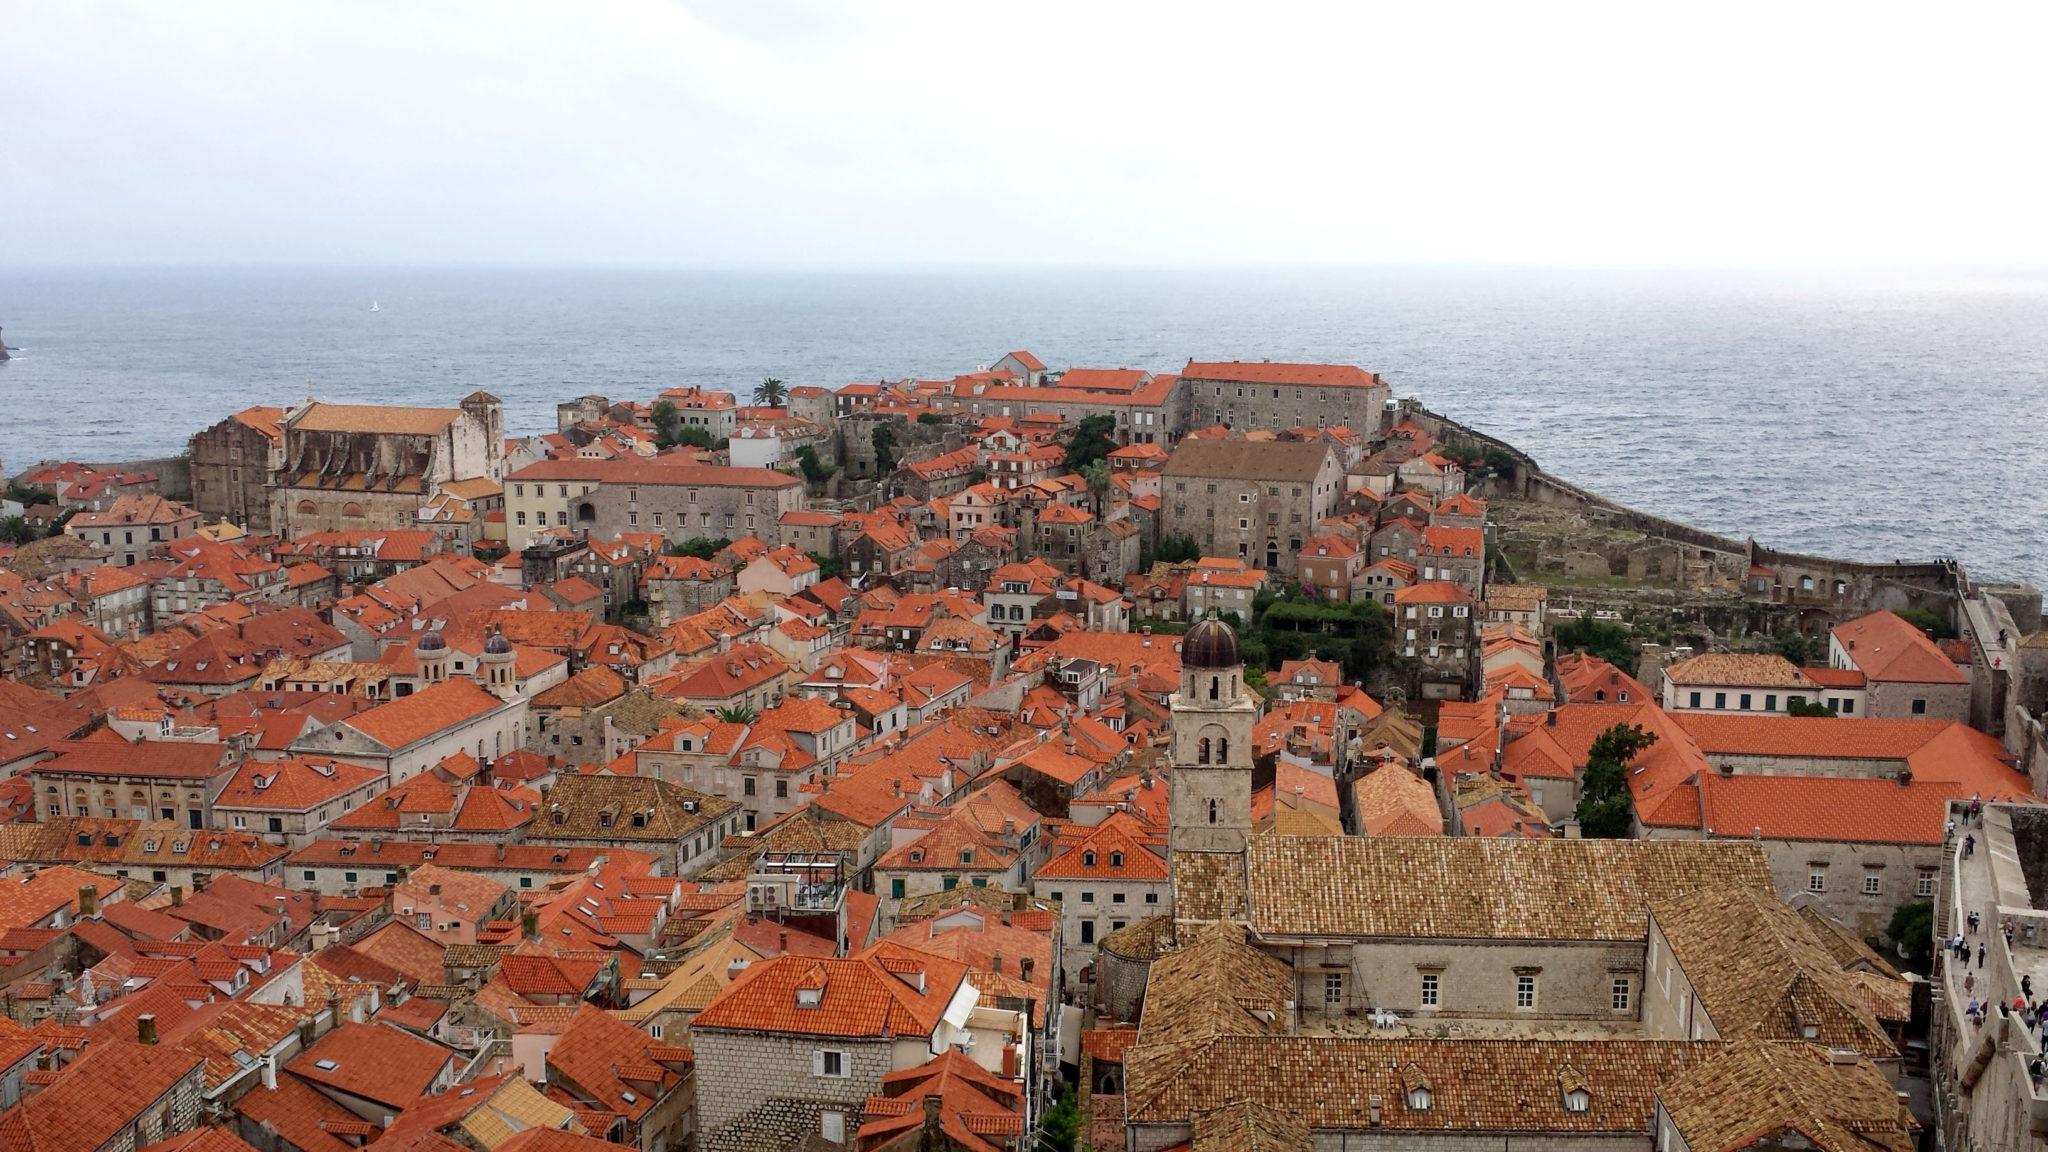 Hema_blog_mode_voyage_croatie_une_journee_a_dubrovnik_vue_sur_la_ville19